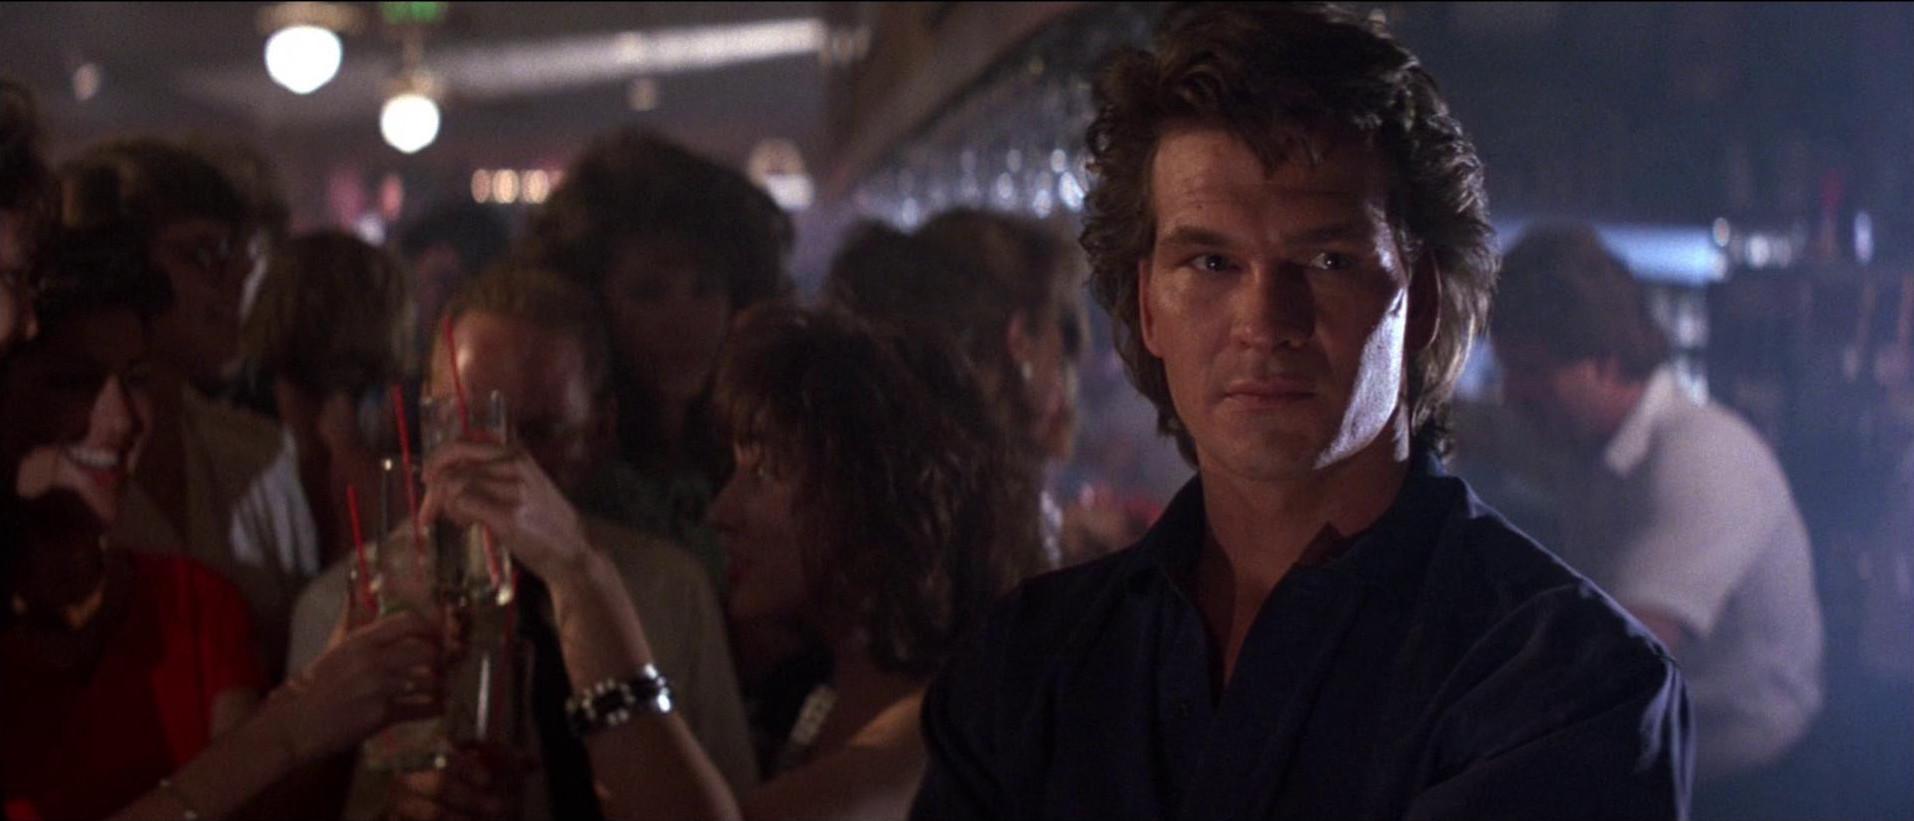 Drunken Cinema: Patrick Swayze in ROAD HOUSE (1989 ...